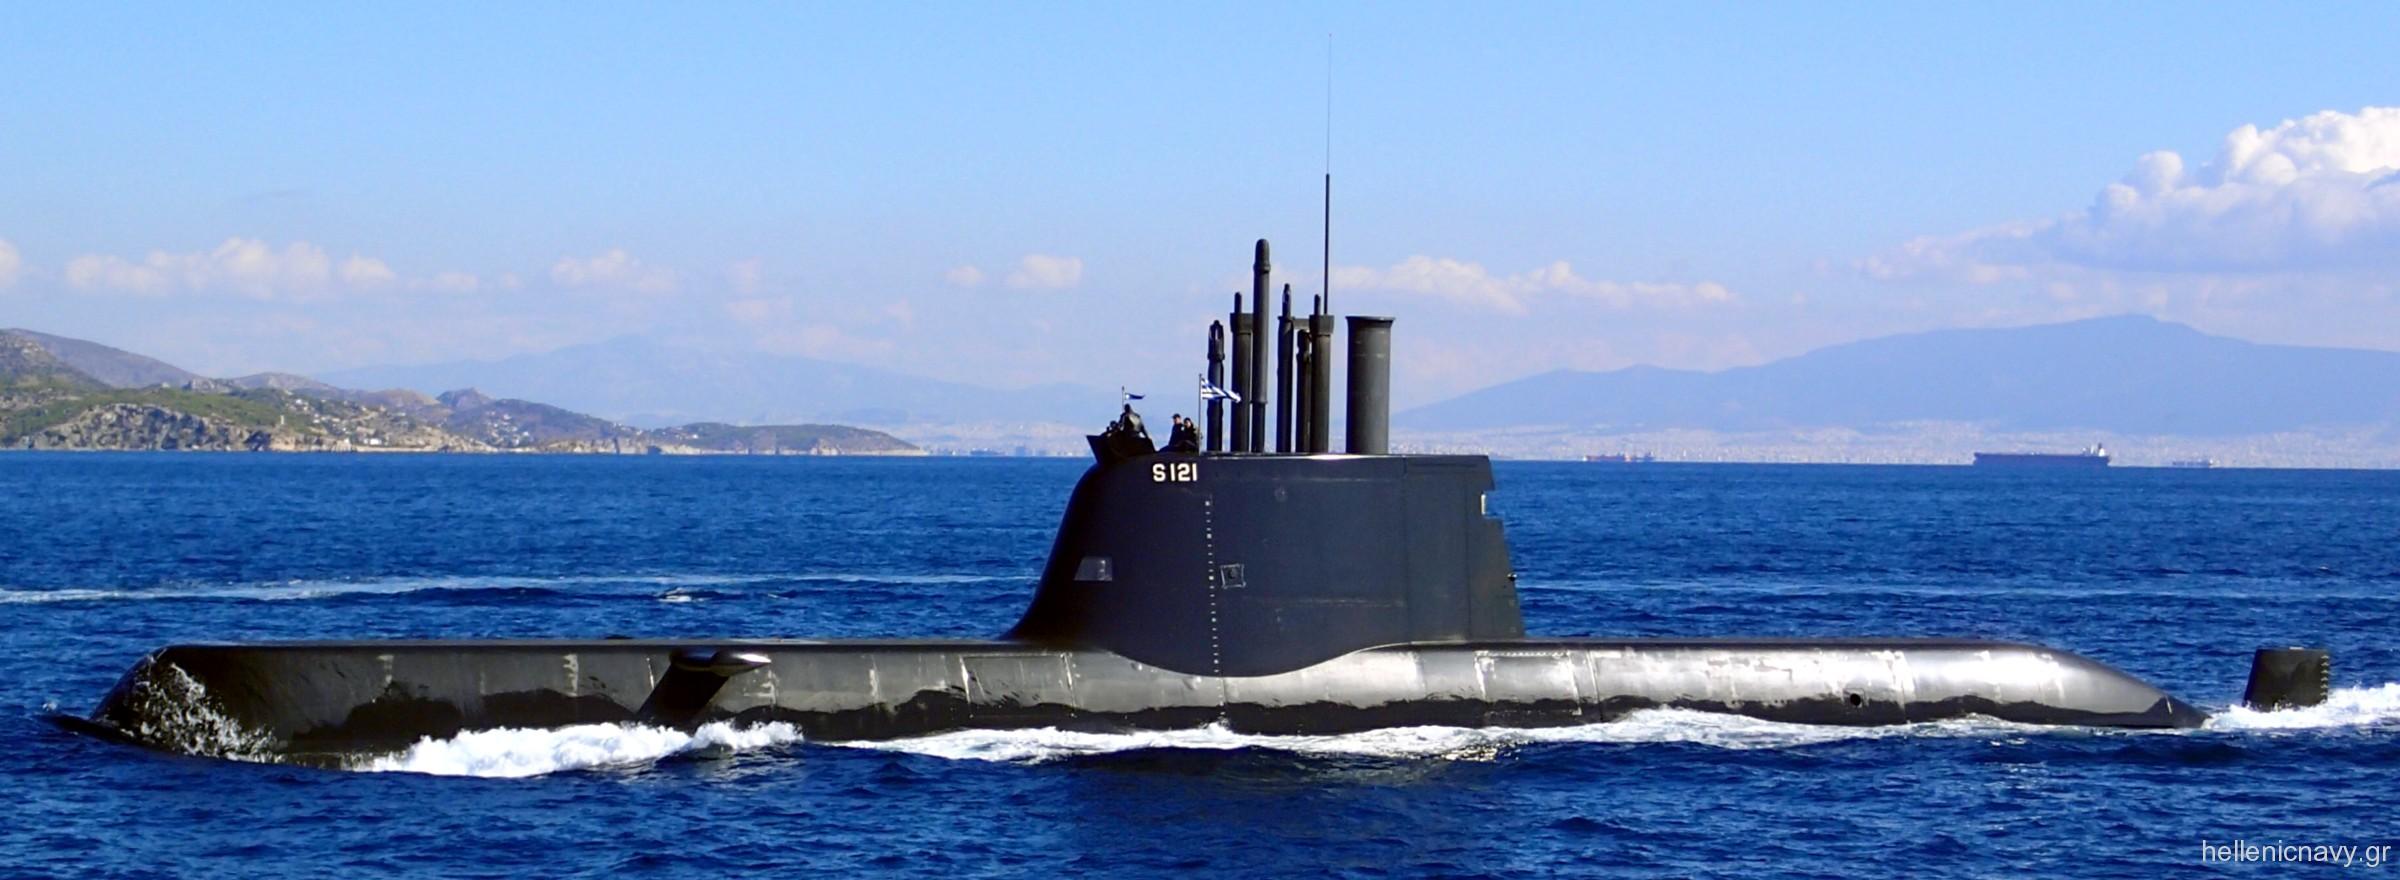 papanikolis class type 214 submarine hellenic navy greece pipinos matrozos  katsonis aip propulsion hdw siemens